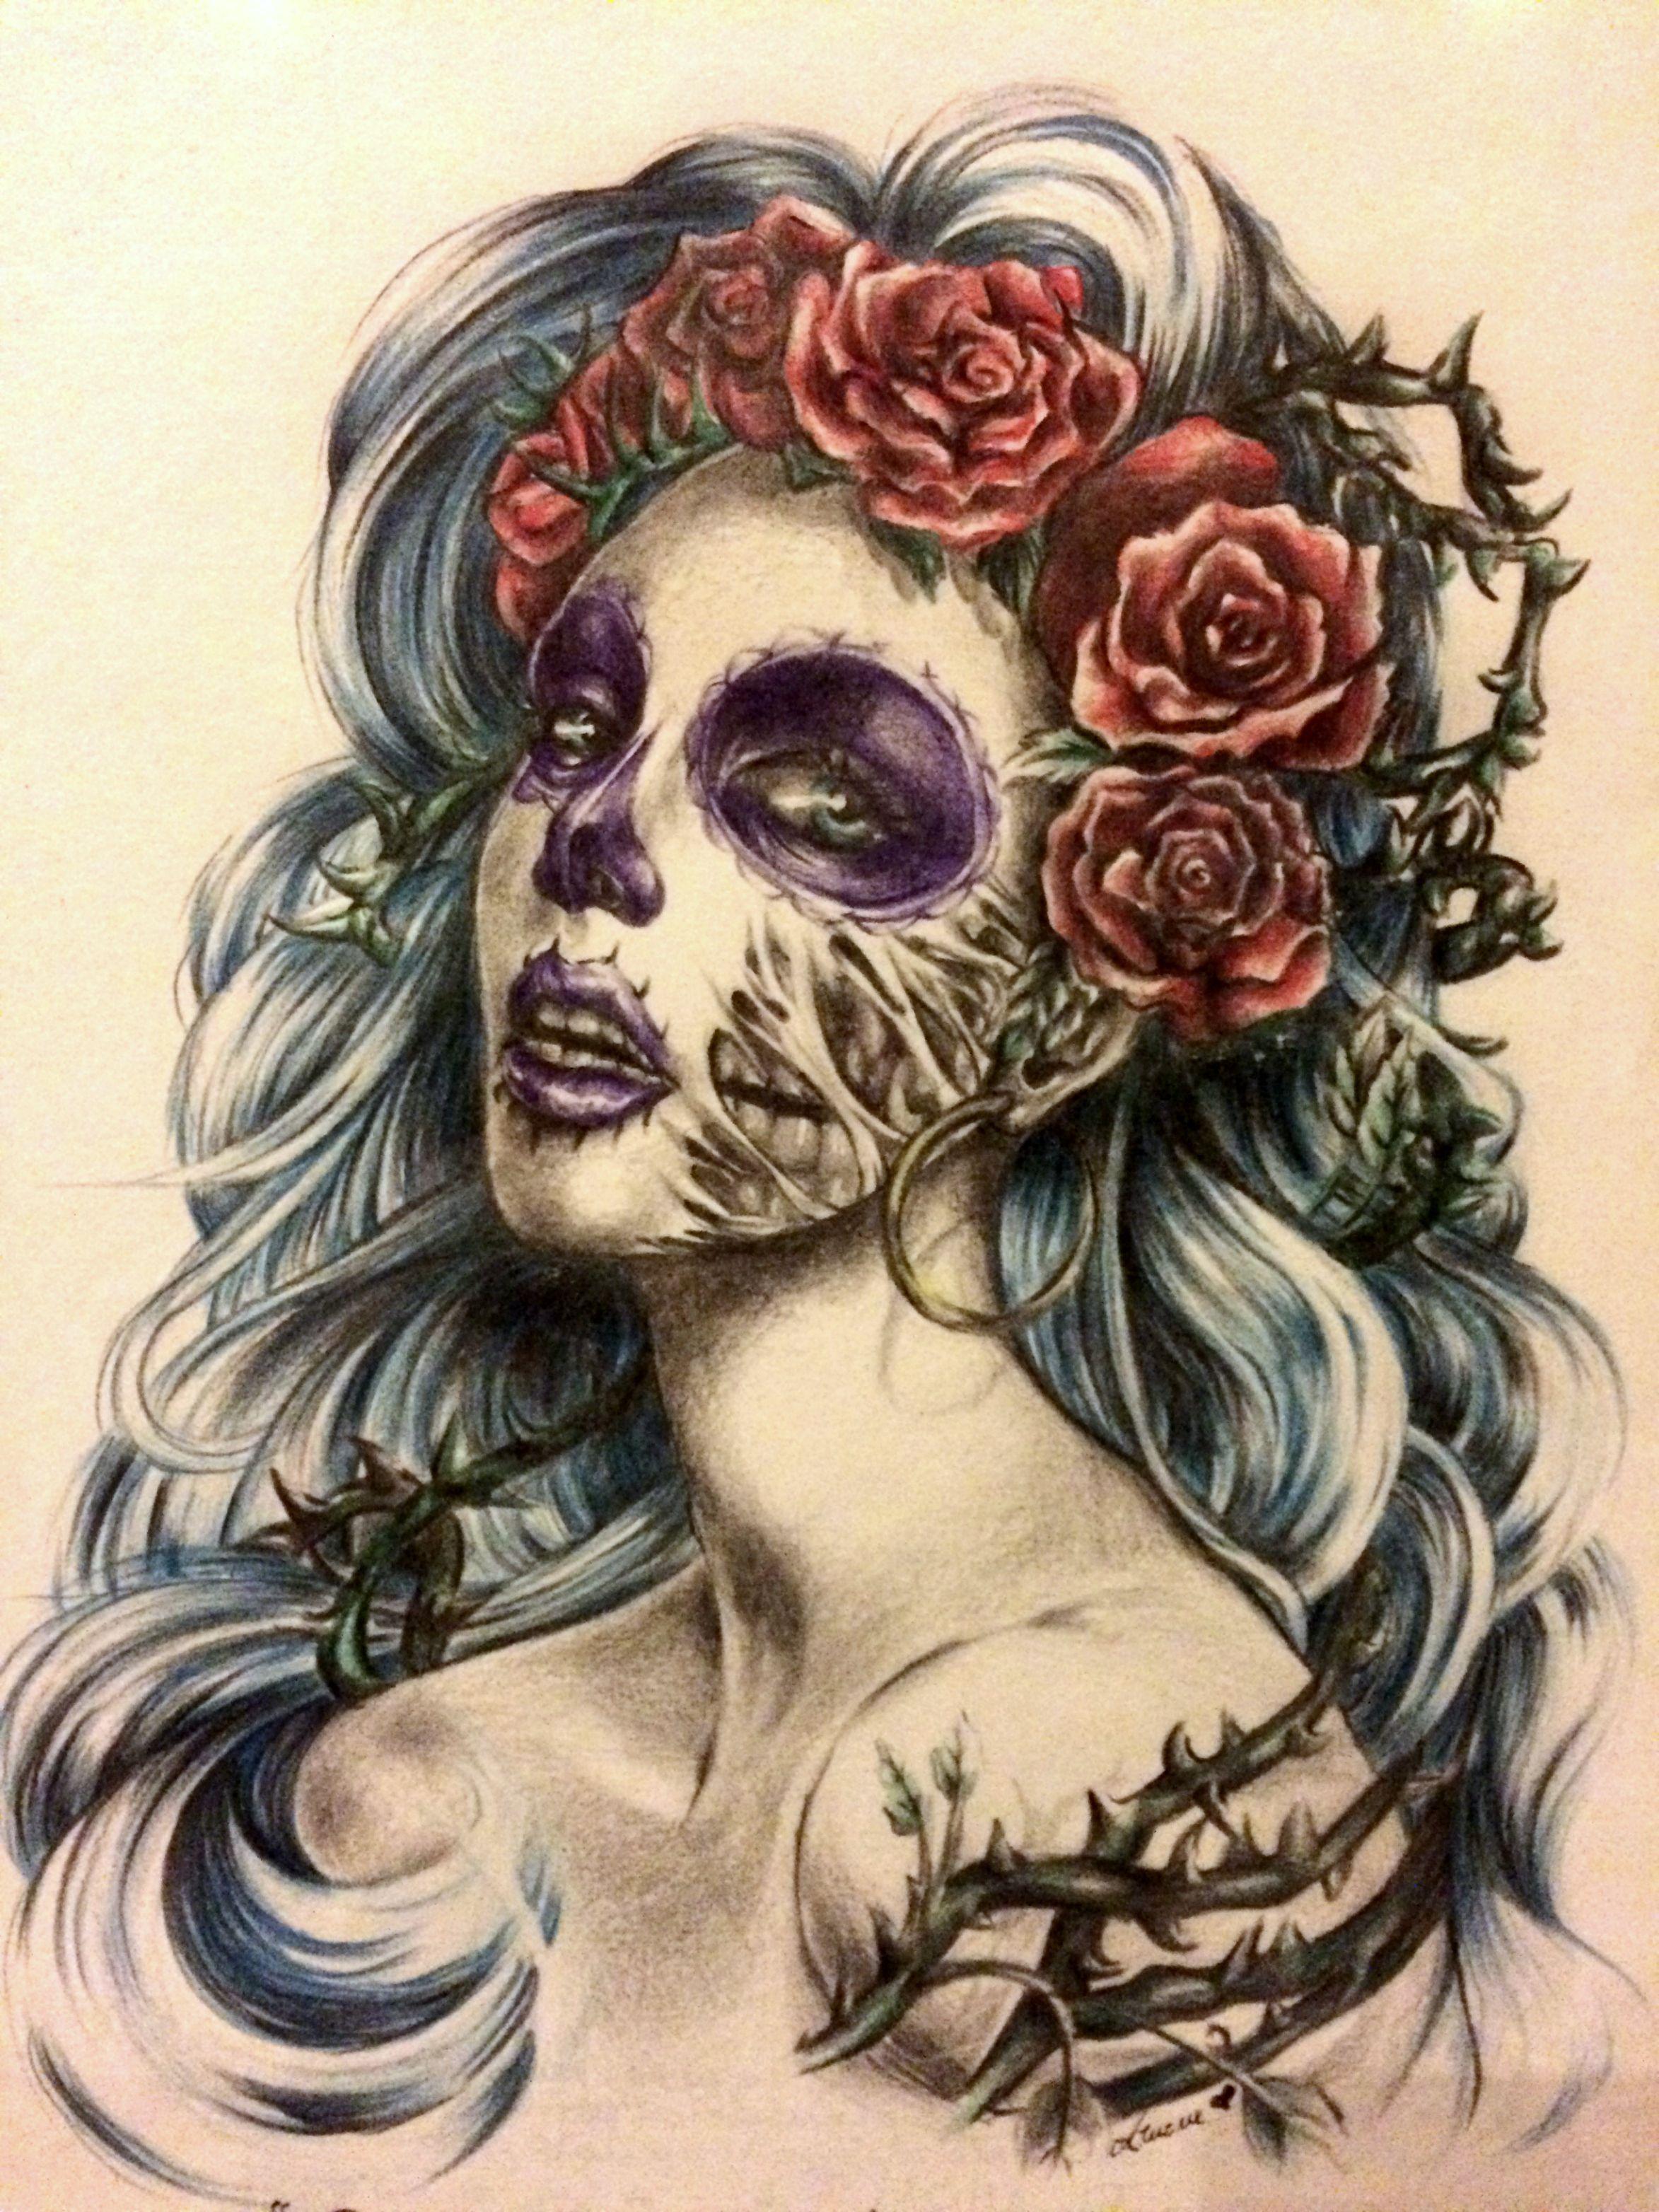 Santa Muerte Tattoo With Roses Tatuagem Caveira Desenho Caveira